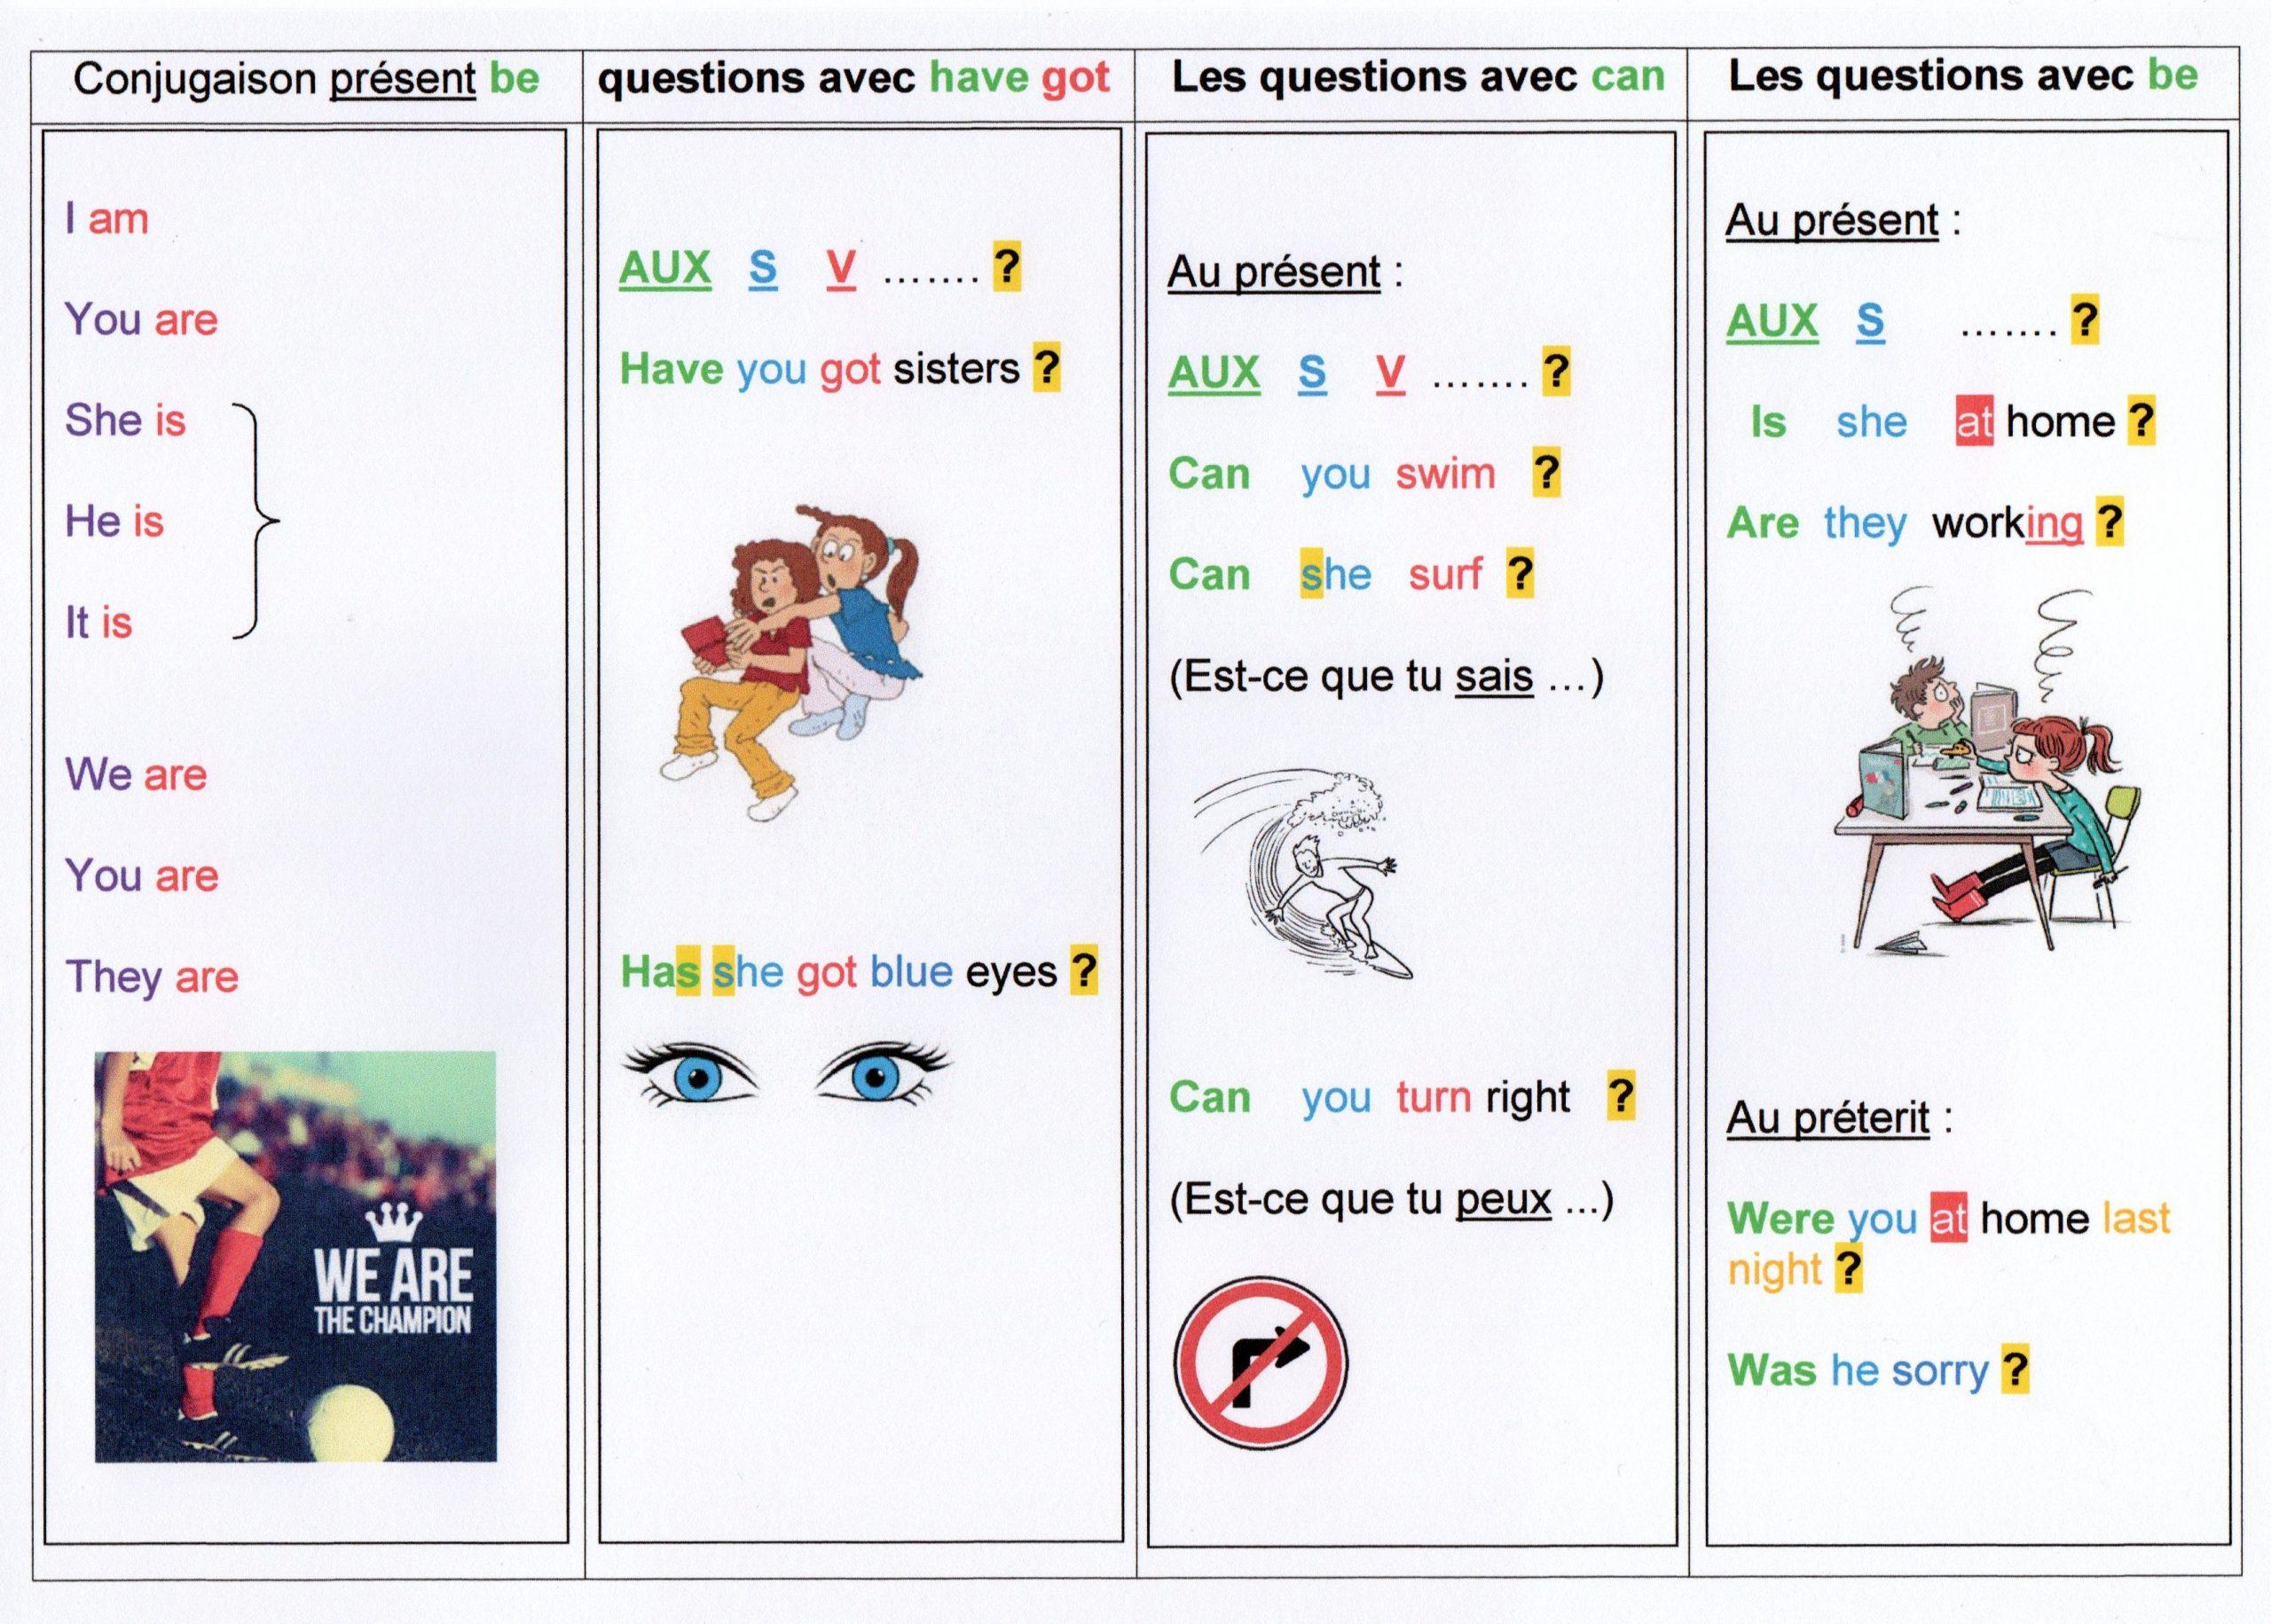 E9C8Bdfe3E Anglais Imprimer - Nagarjunkhabar tout Jeux Éducatifs Collège À Imprimer